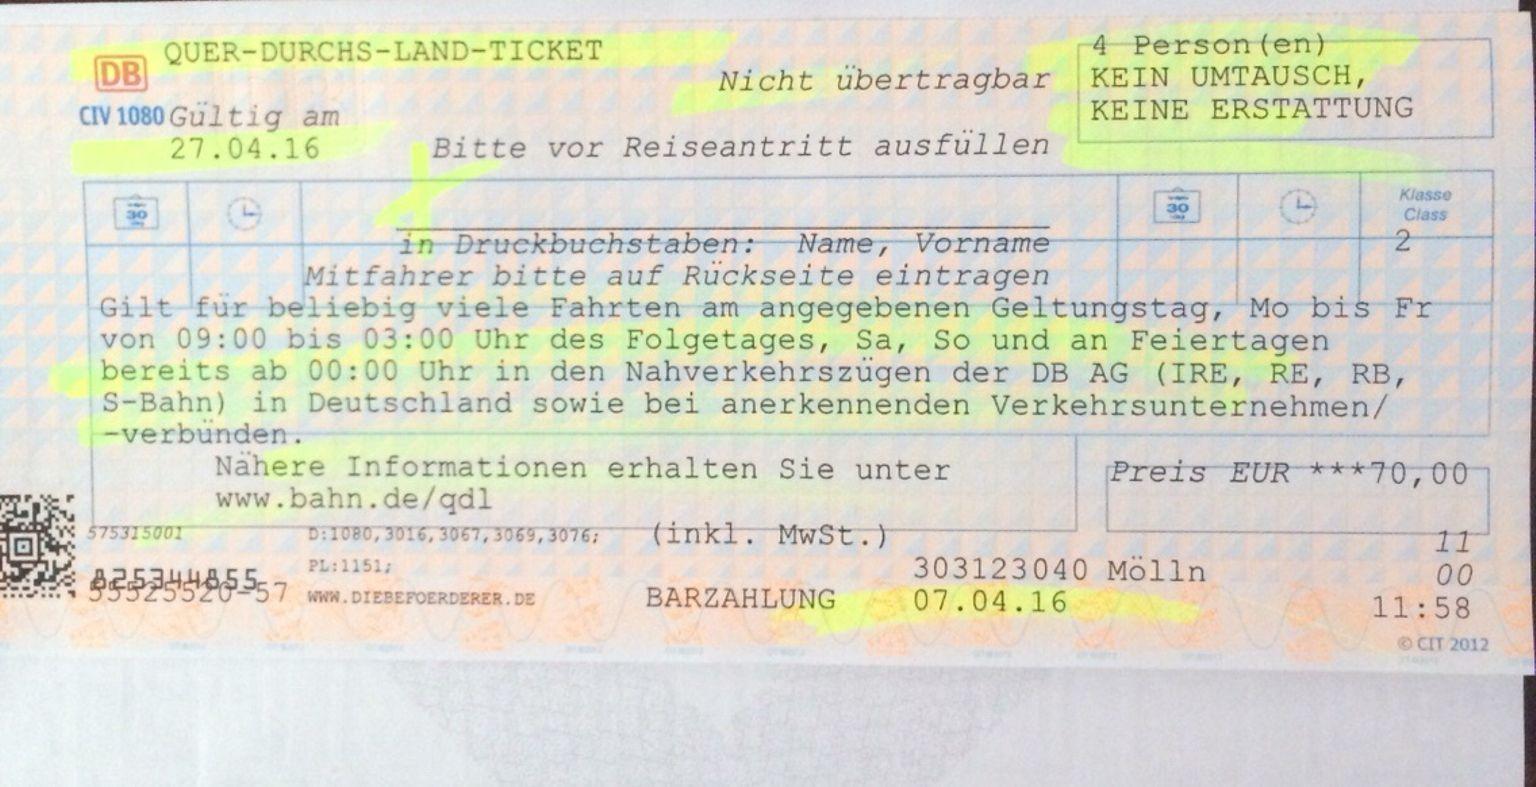 Germany Railway weekday ticket